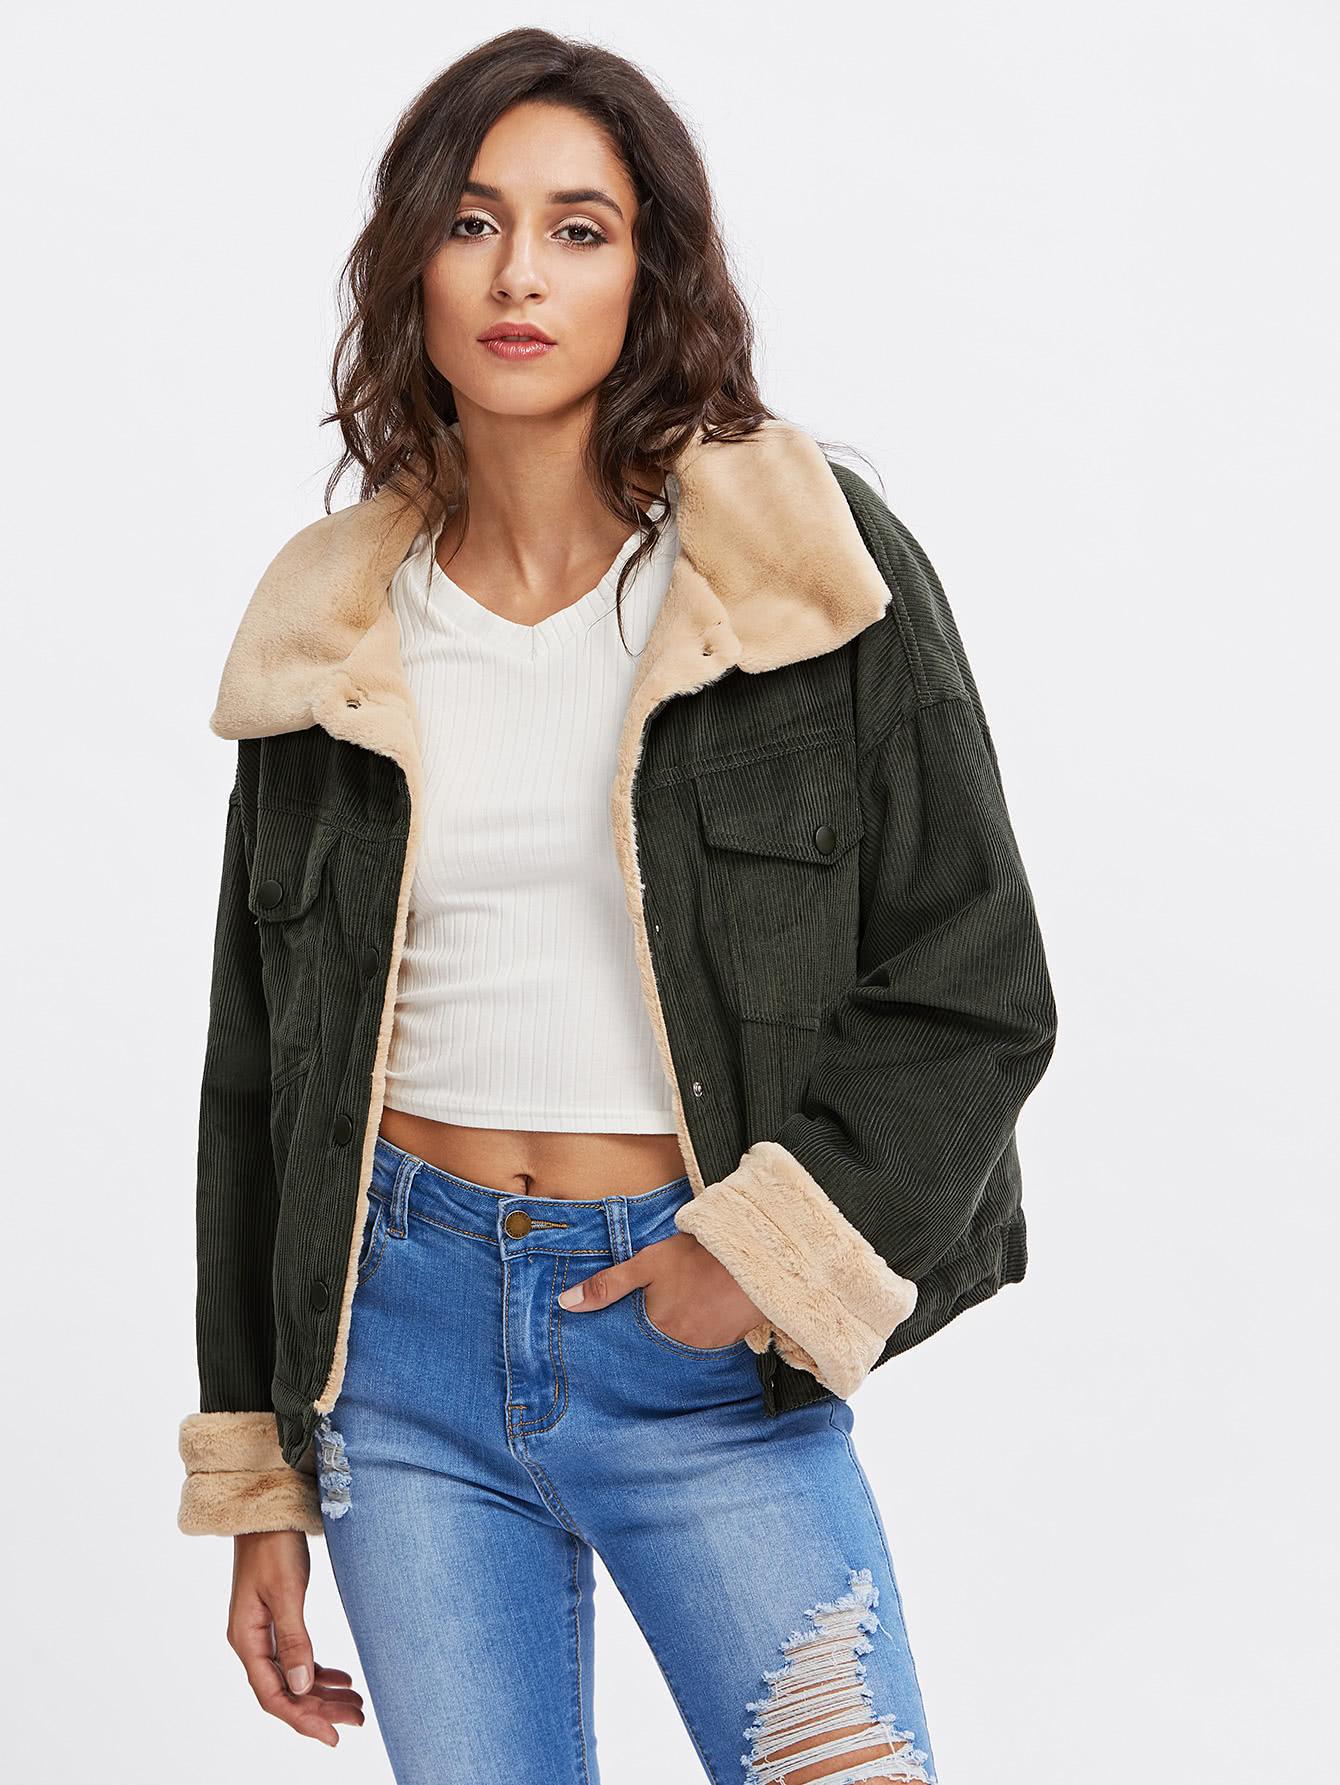 Corduroy Contrast Short Faux Fur Jacket drop shoulder contrast faux fur sleeve sweatshirt